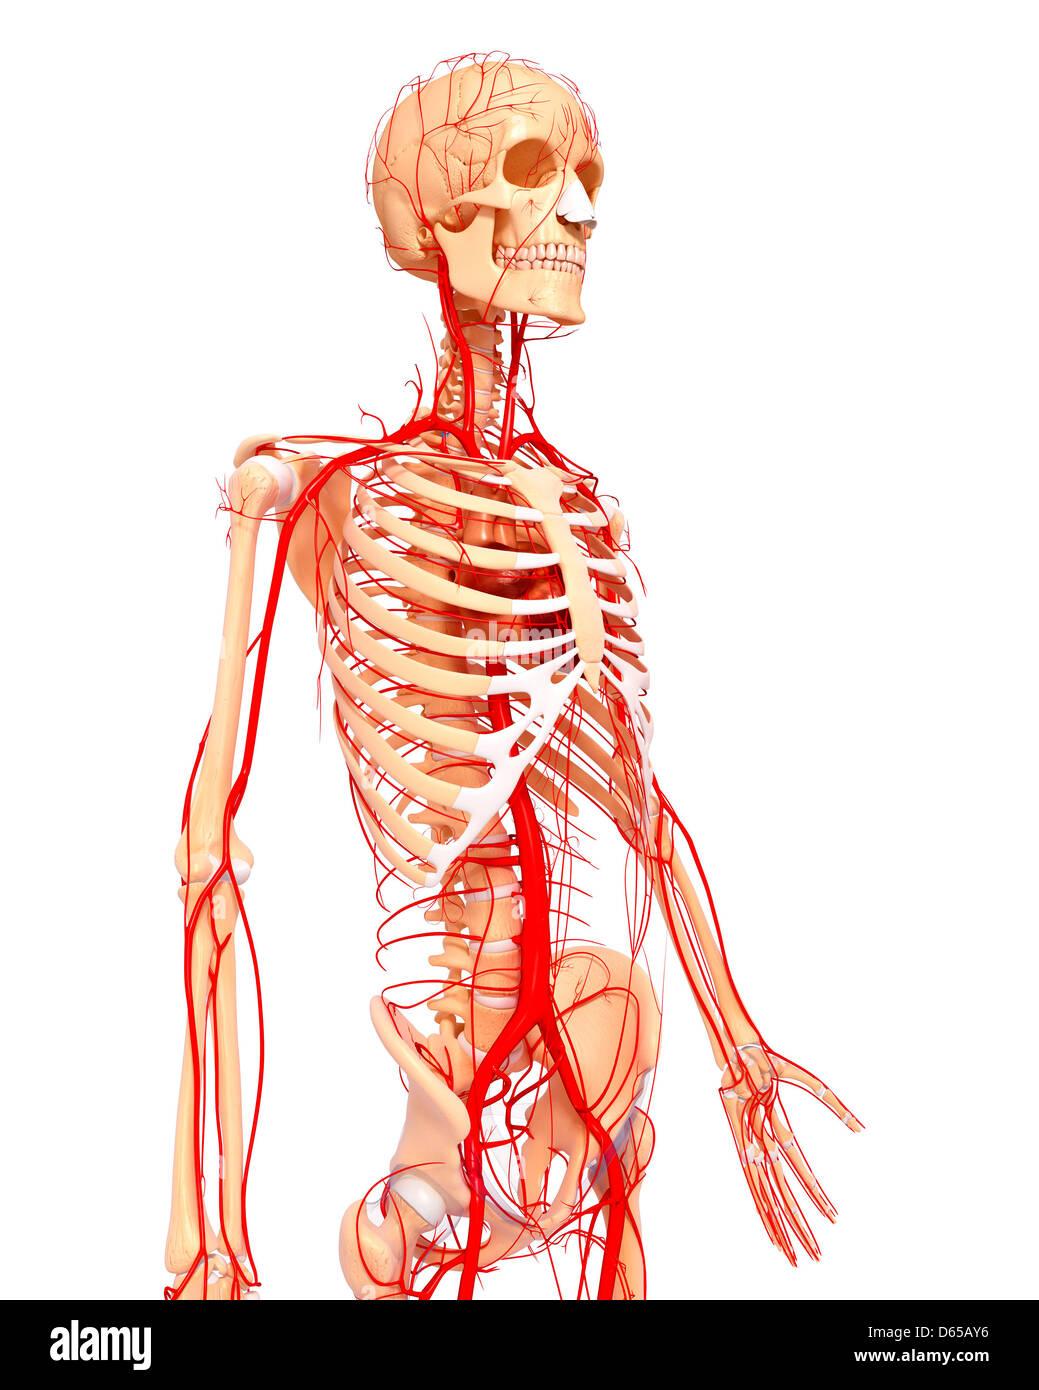 Human Arteries Artwork Stock Photo 55437402 Alamy